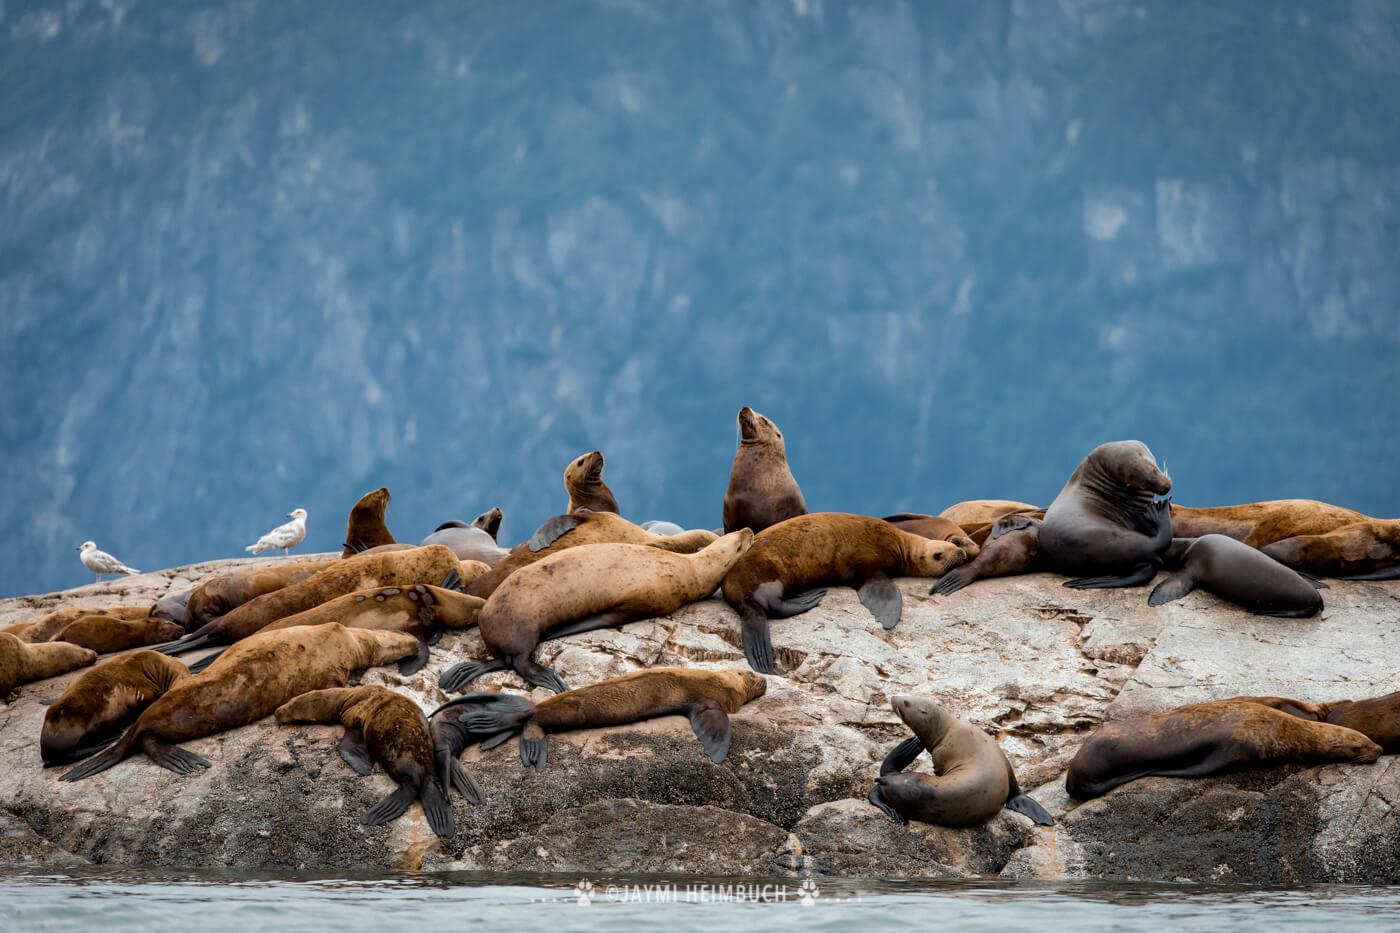 Steller sea lions rest near South Marble Island in Glacier Bay. © Jaymi Heimbuch